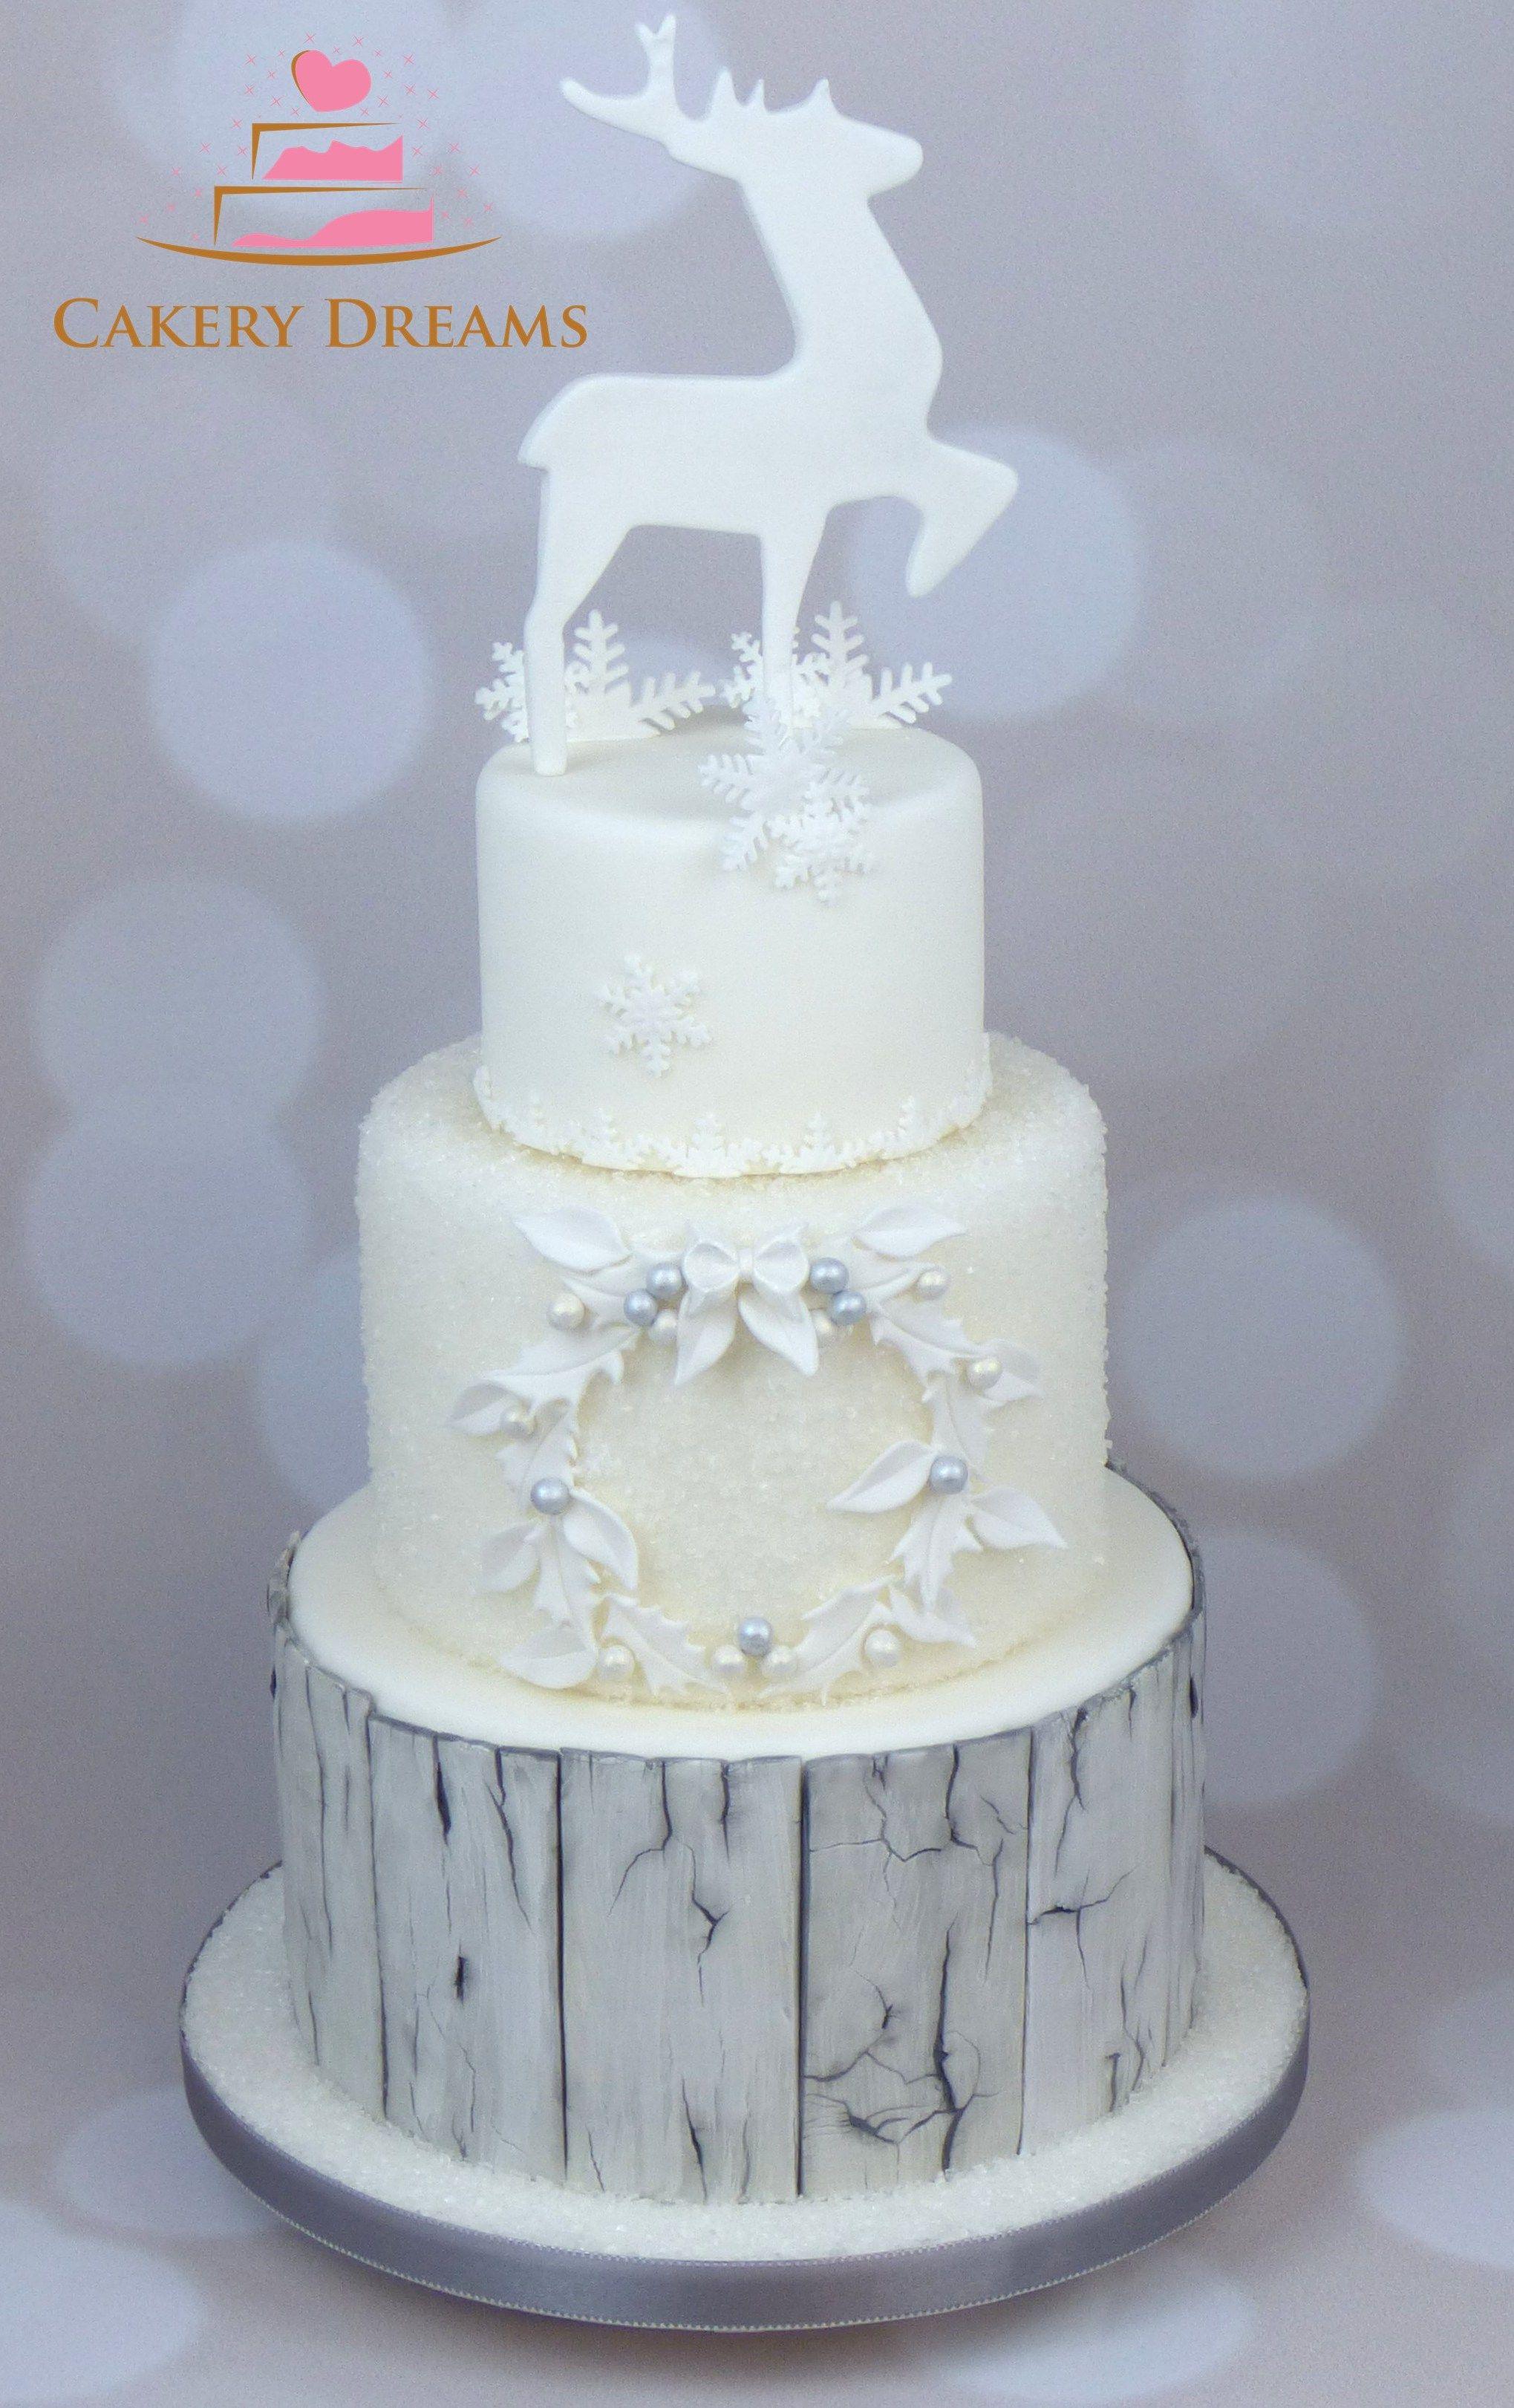 Tswana traditional wedding decor 2018  winter torte cake  LoVe  in   Pinterest  Torte cake and Cake